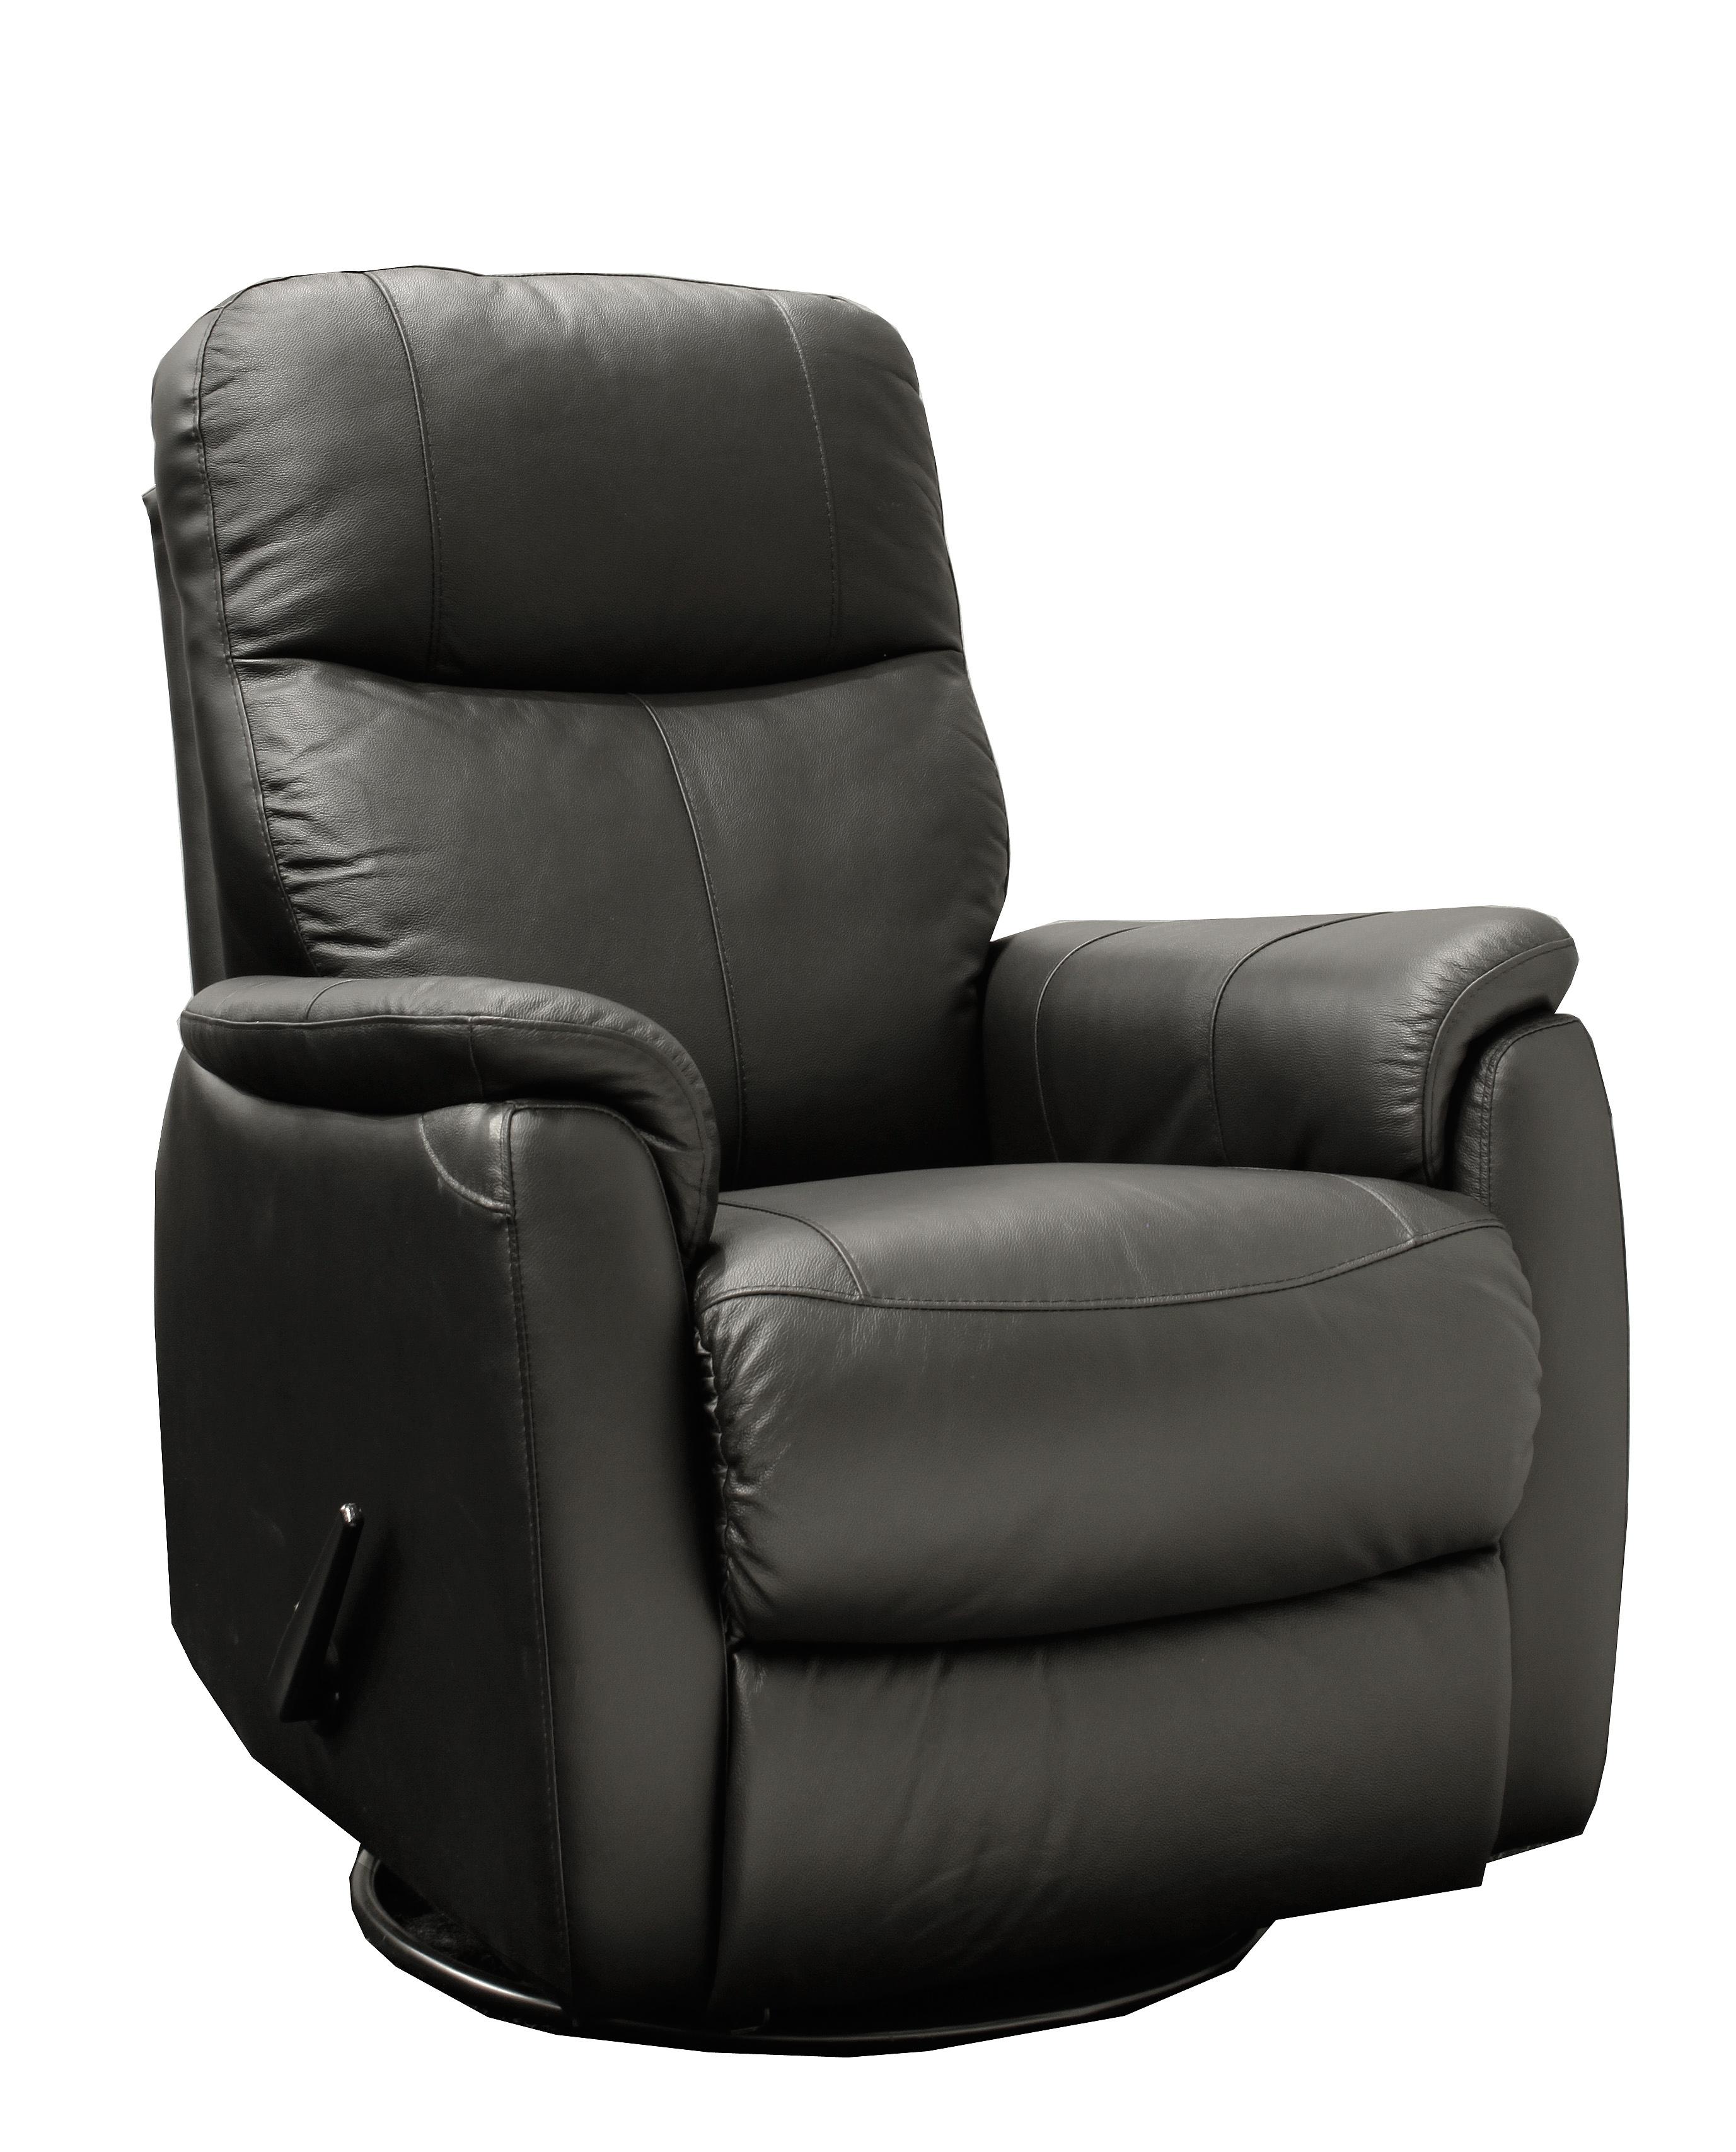 Jantzen reclinerfåtölj - svart konstskinn